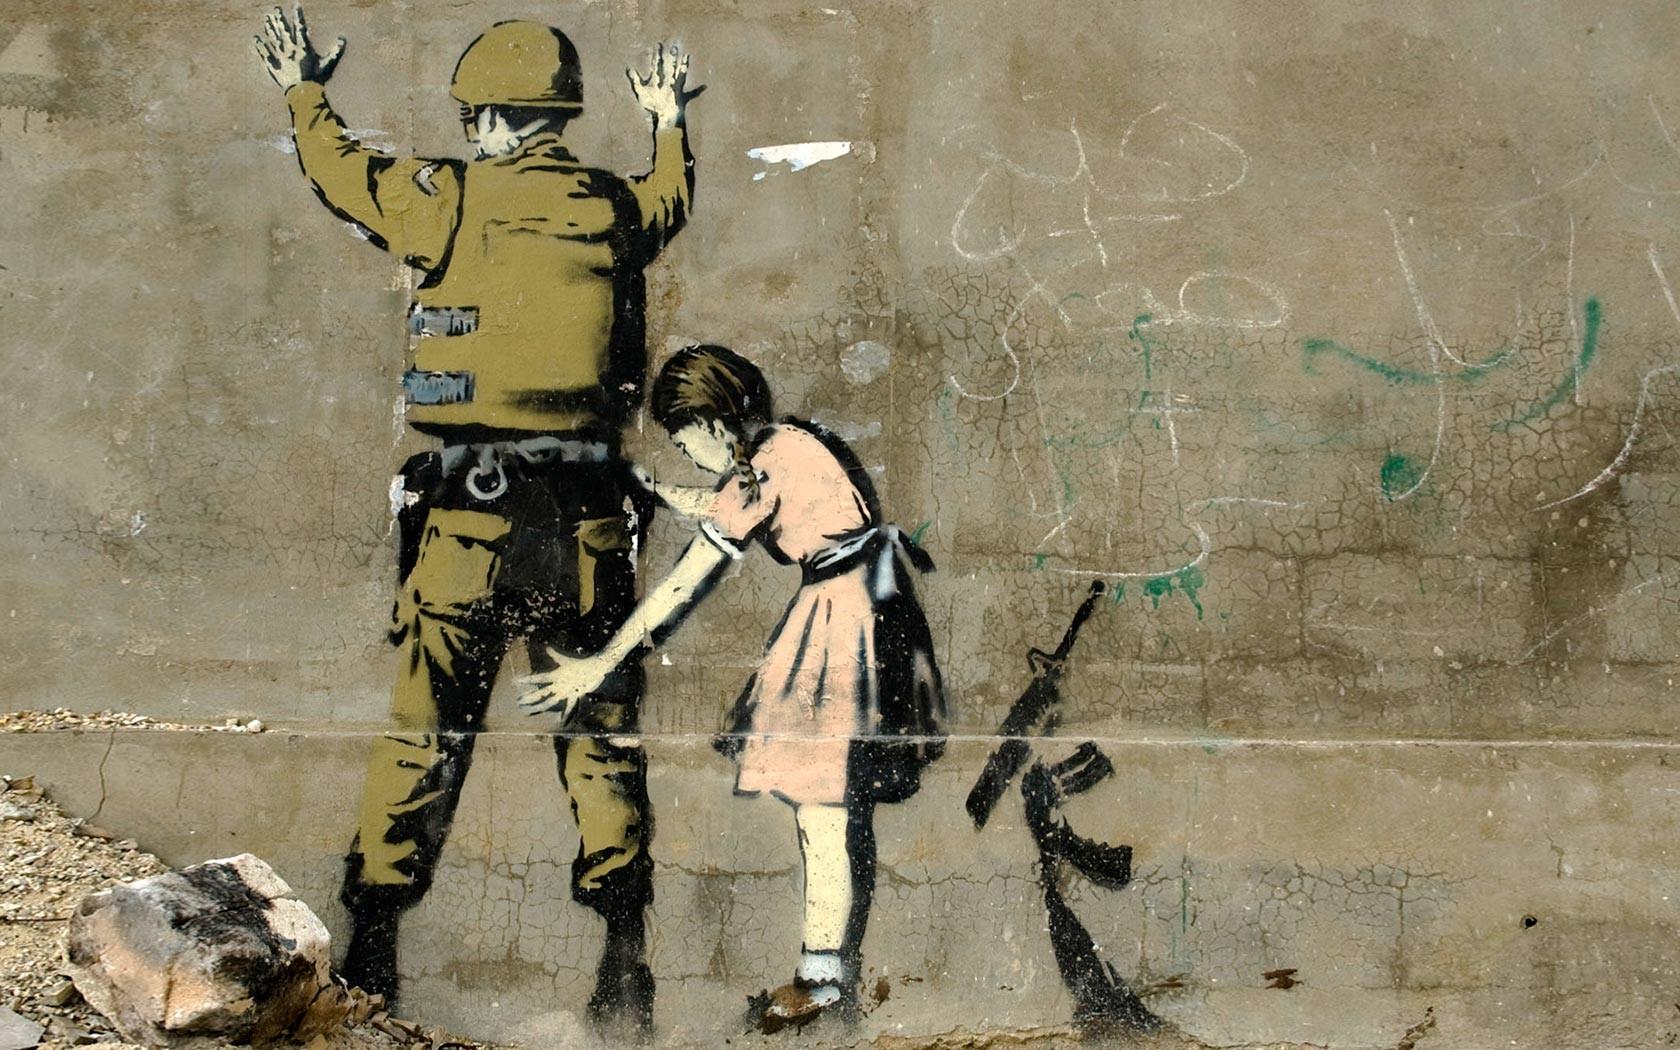 Children Wall Graffiti Street Art Banksy ART